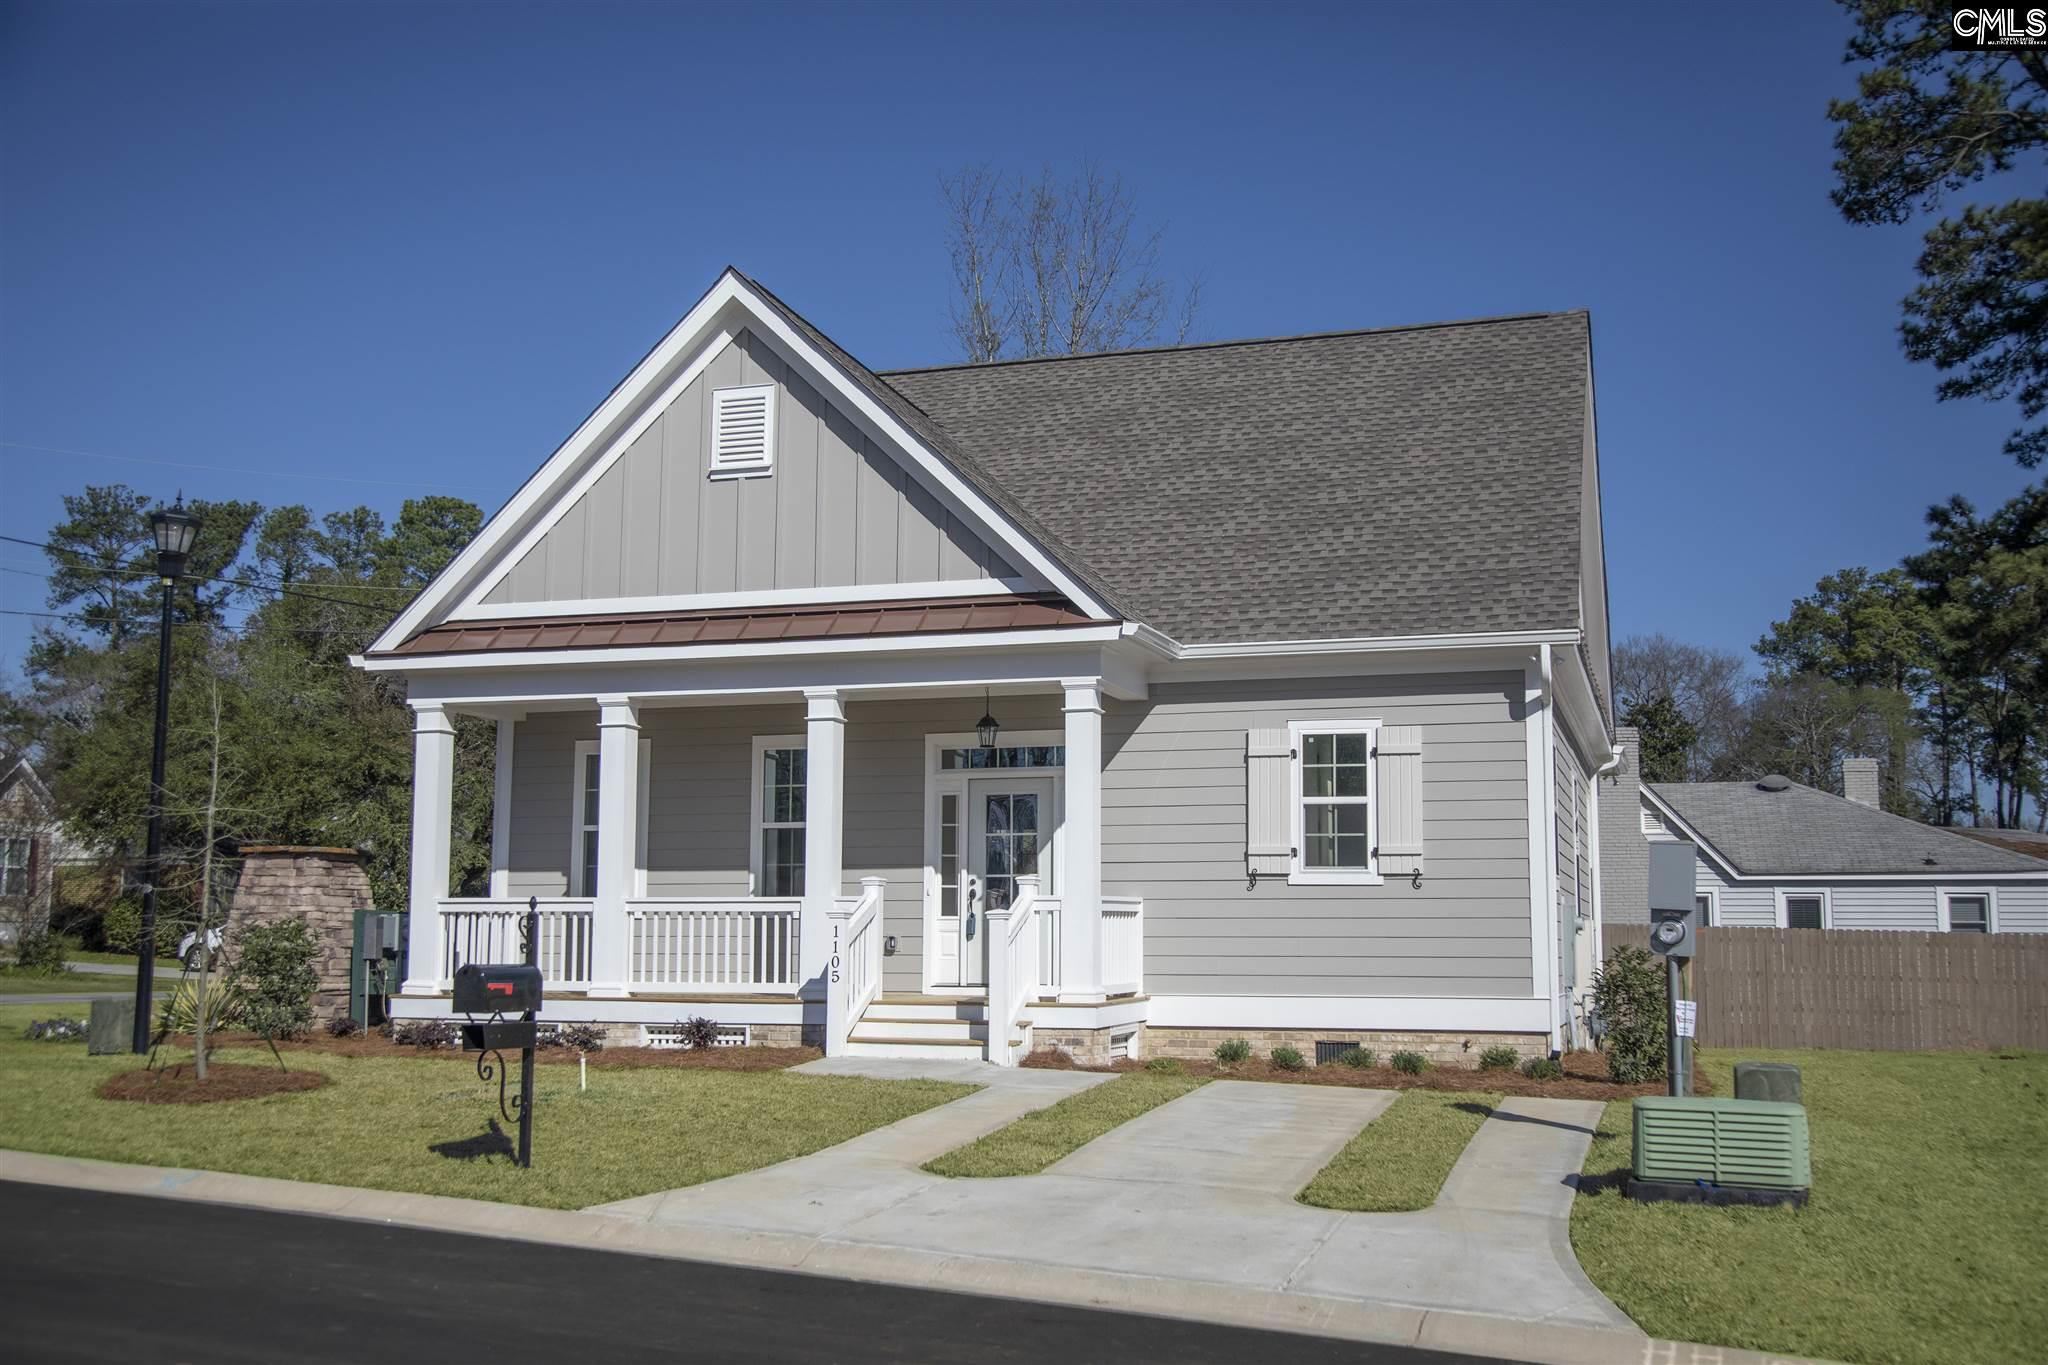 1104 Congaree Bluff Cayce, SC 29033-4427